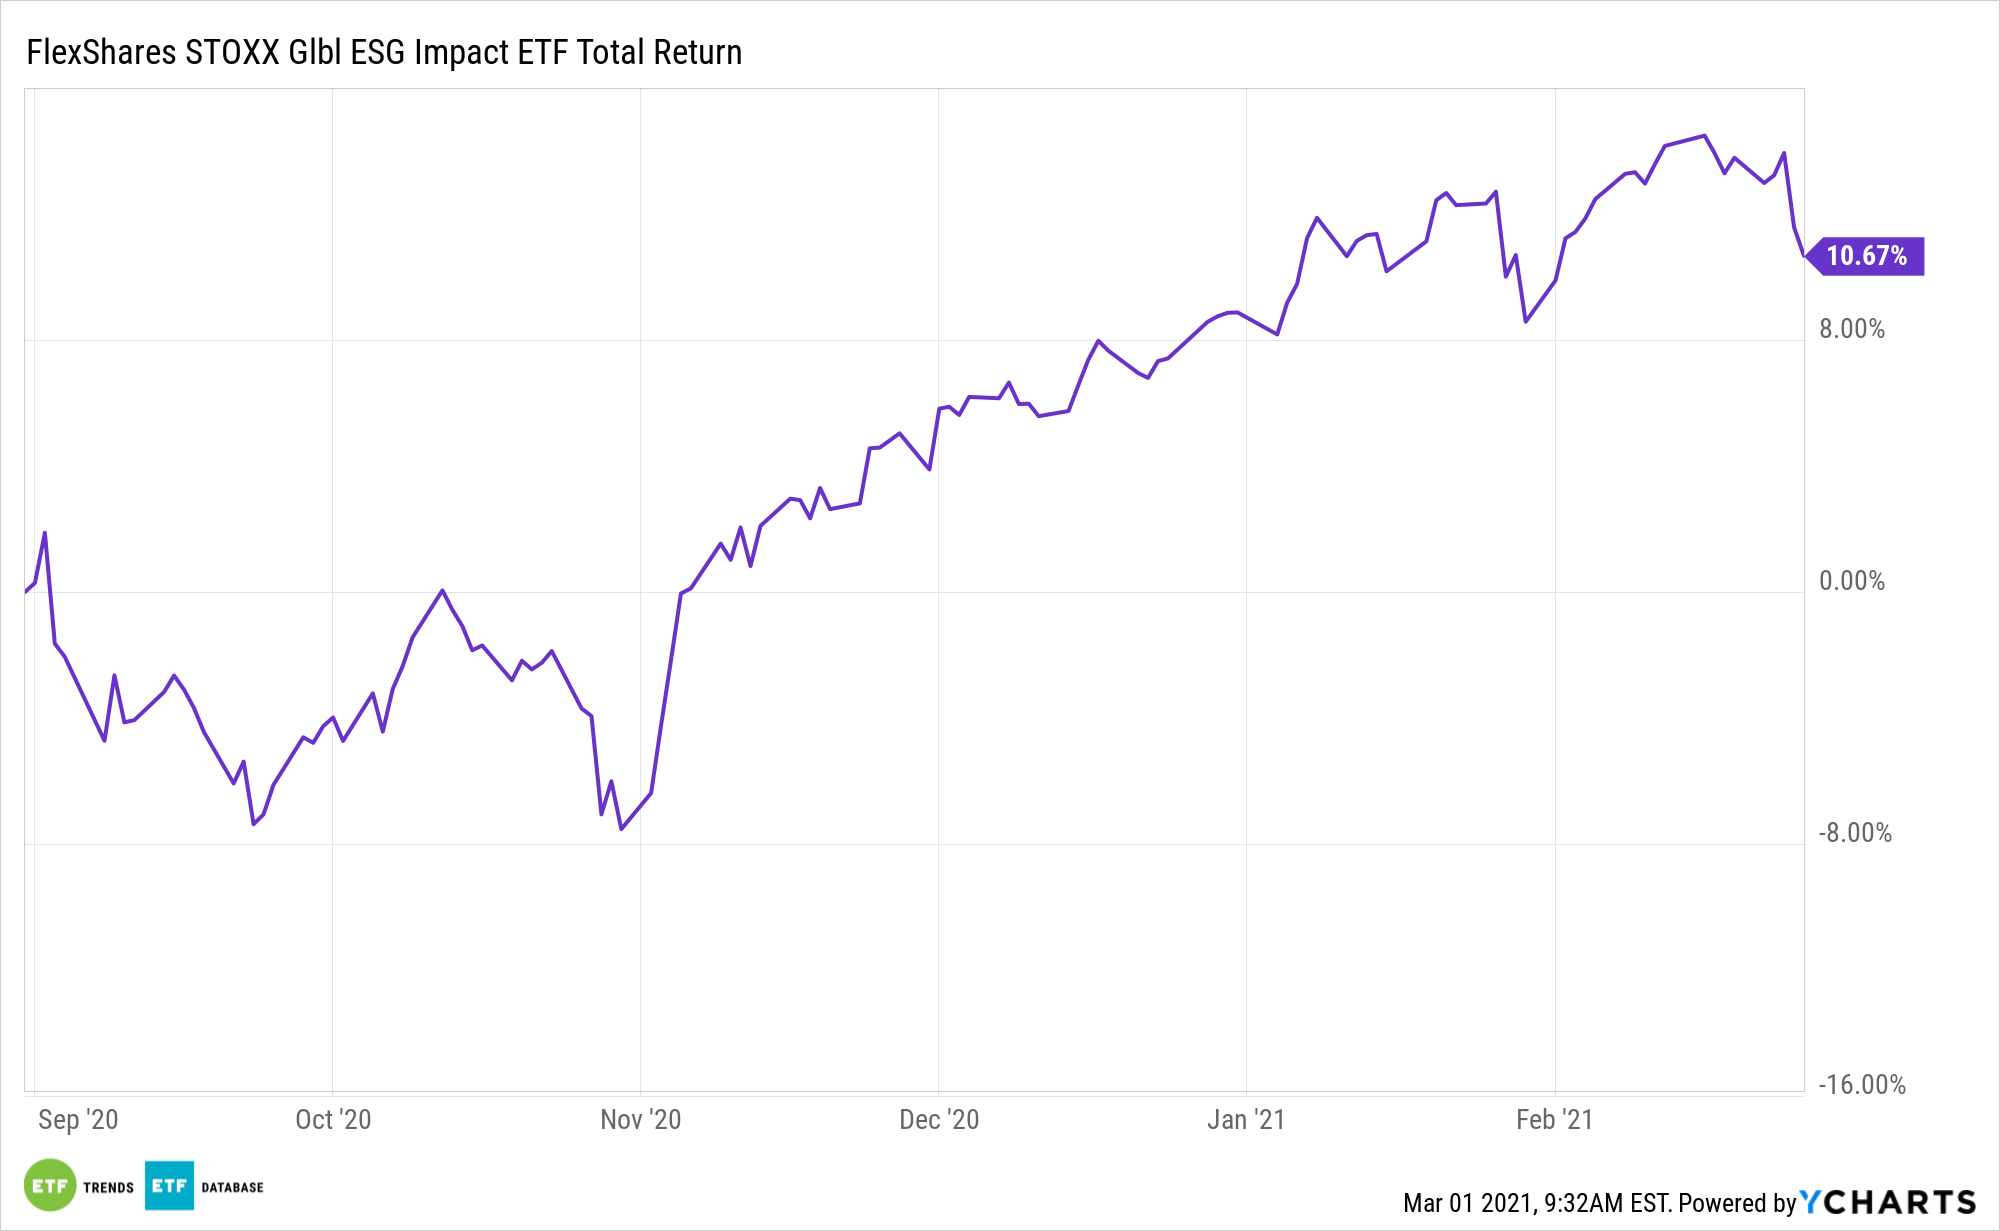 ESGG 6 Month Performance